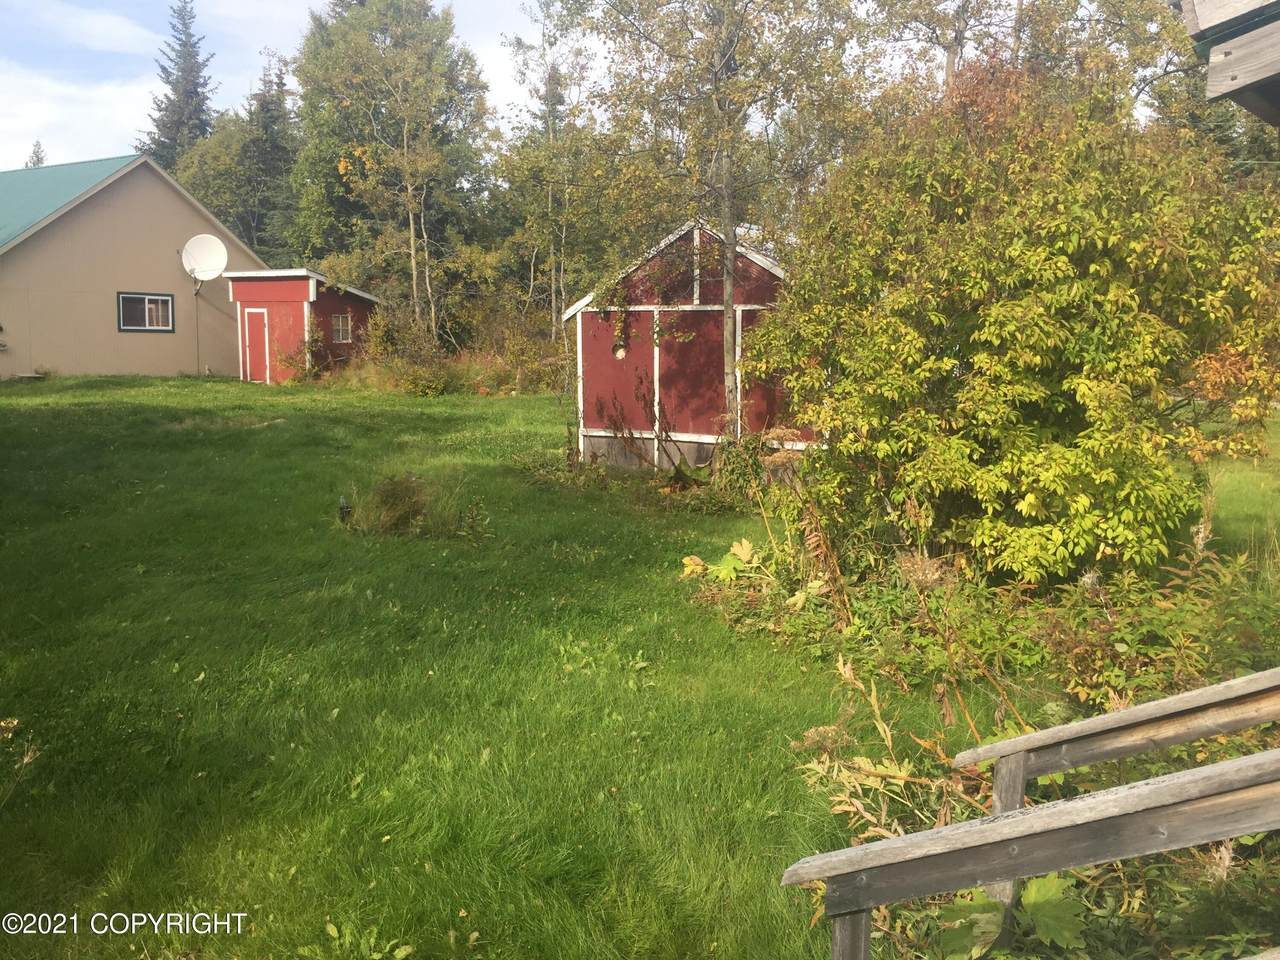 https://bt-photos.global.ssl.fastly.net/alaska/1280_boomver_2_21-7509-2.jpg